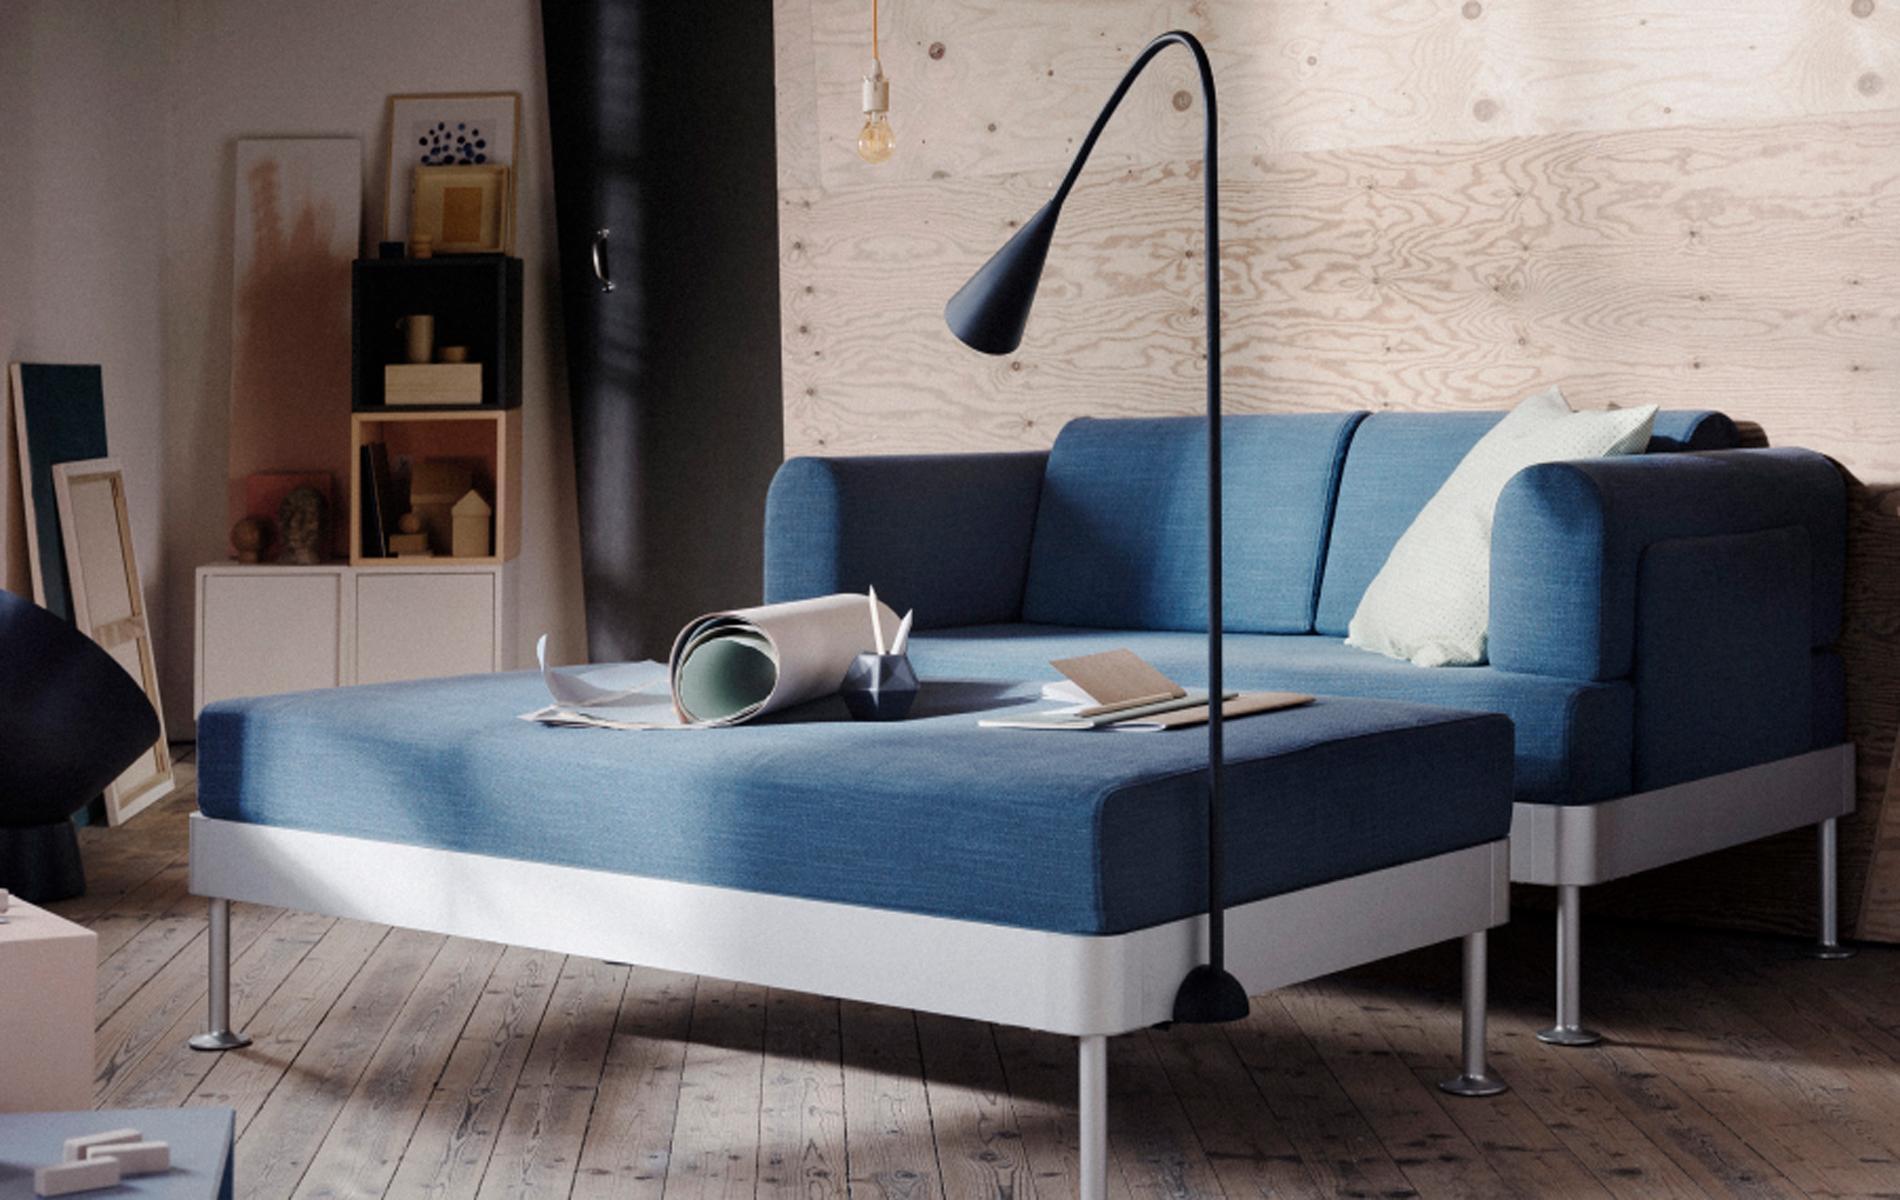 delaktig le canap ultra modulable sign tom dixon pour. Black Bedroom Furniture Sets. Home Design Ideas